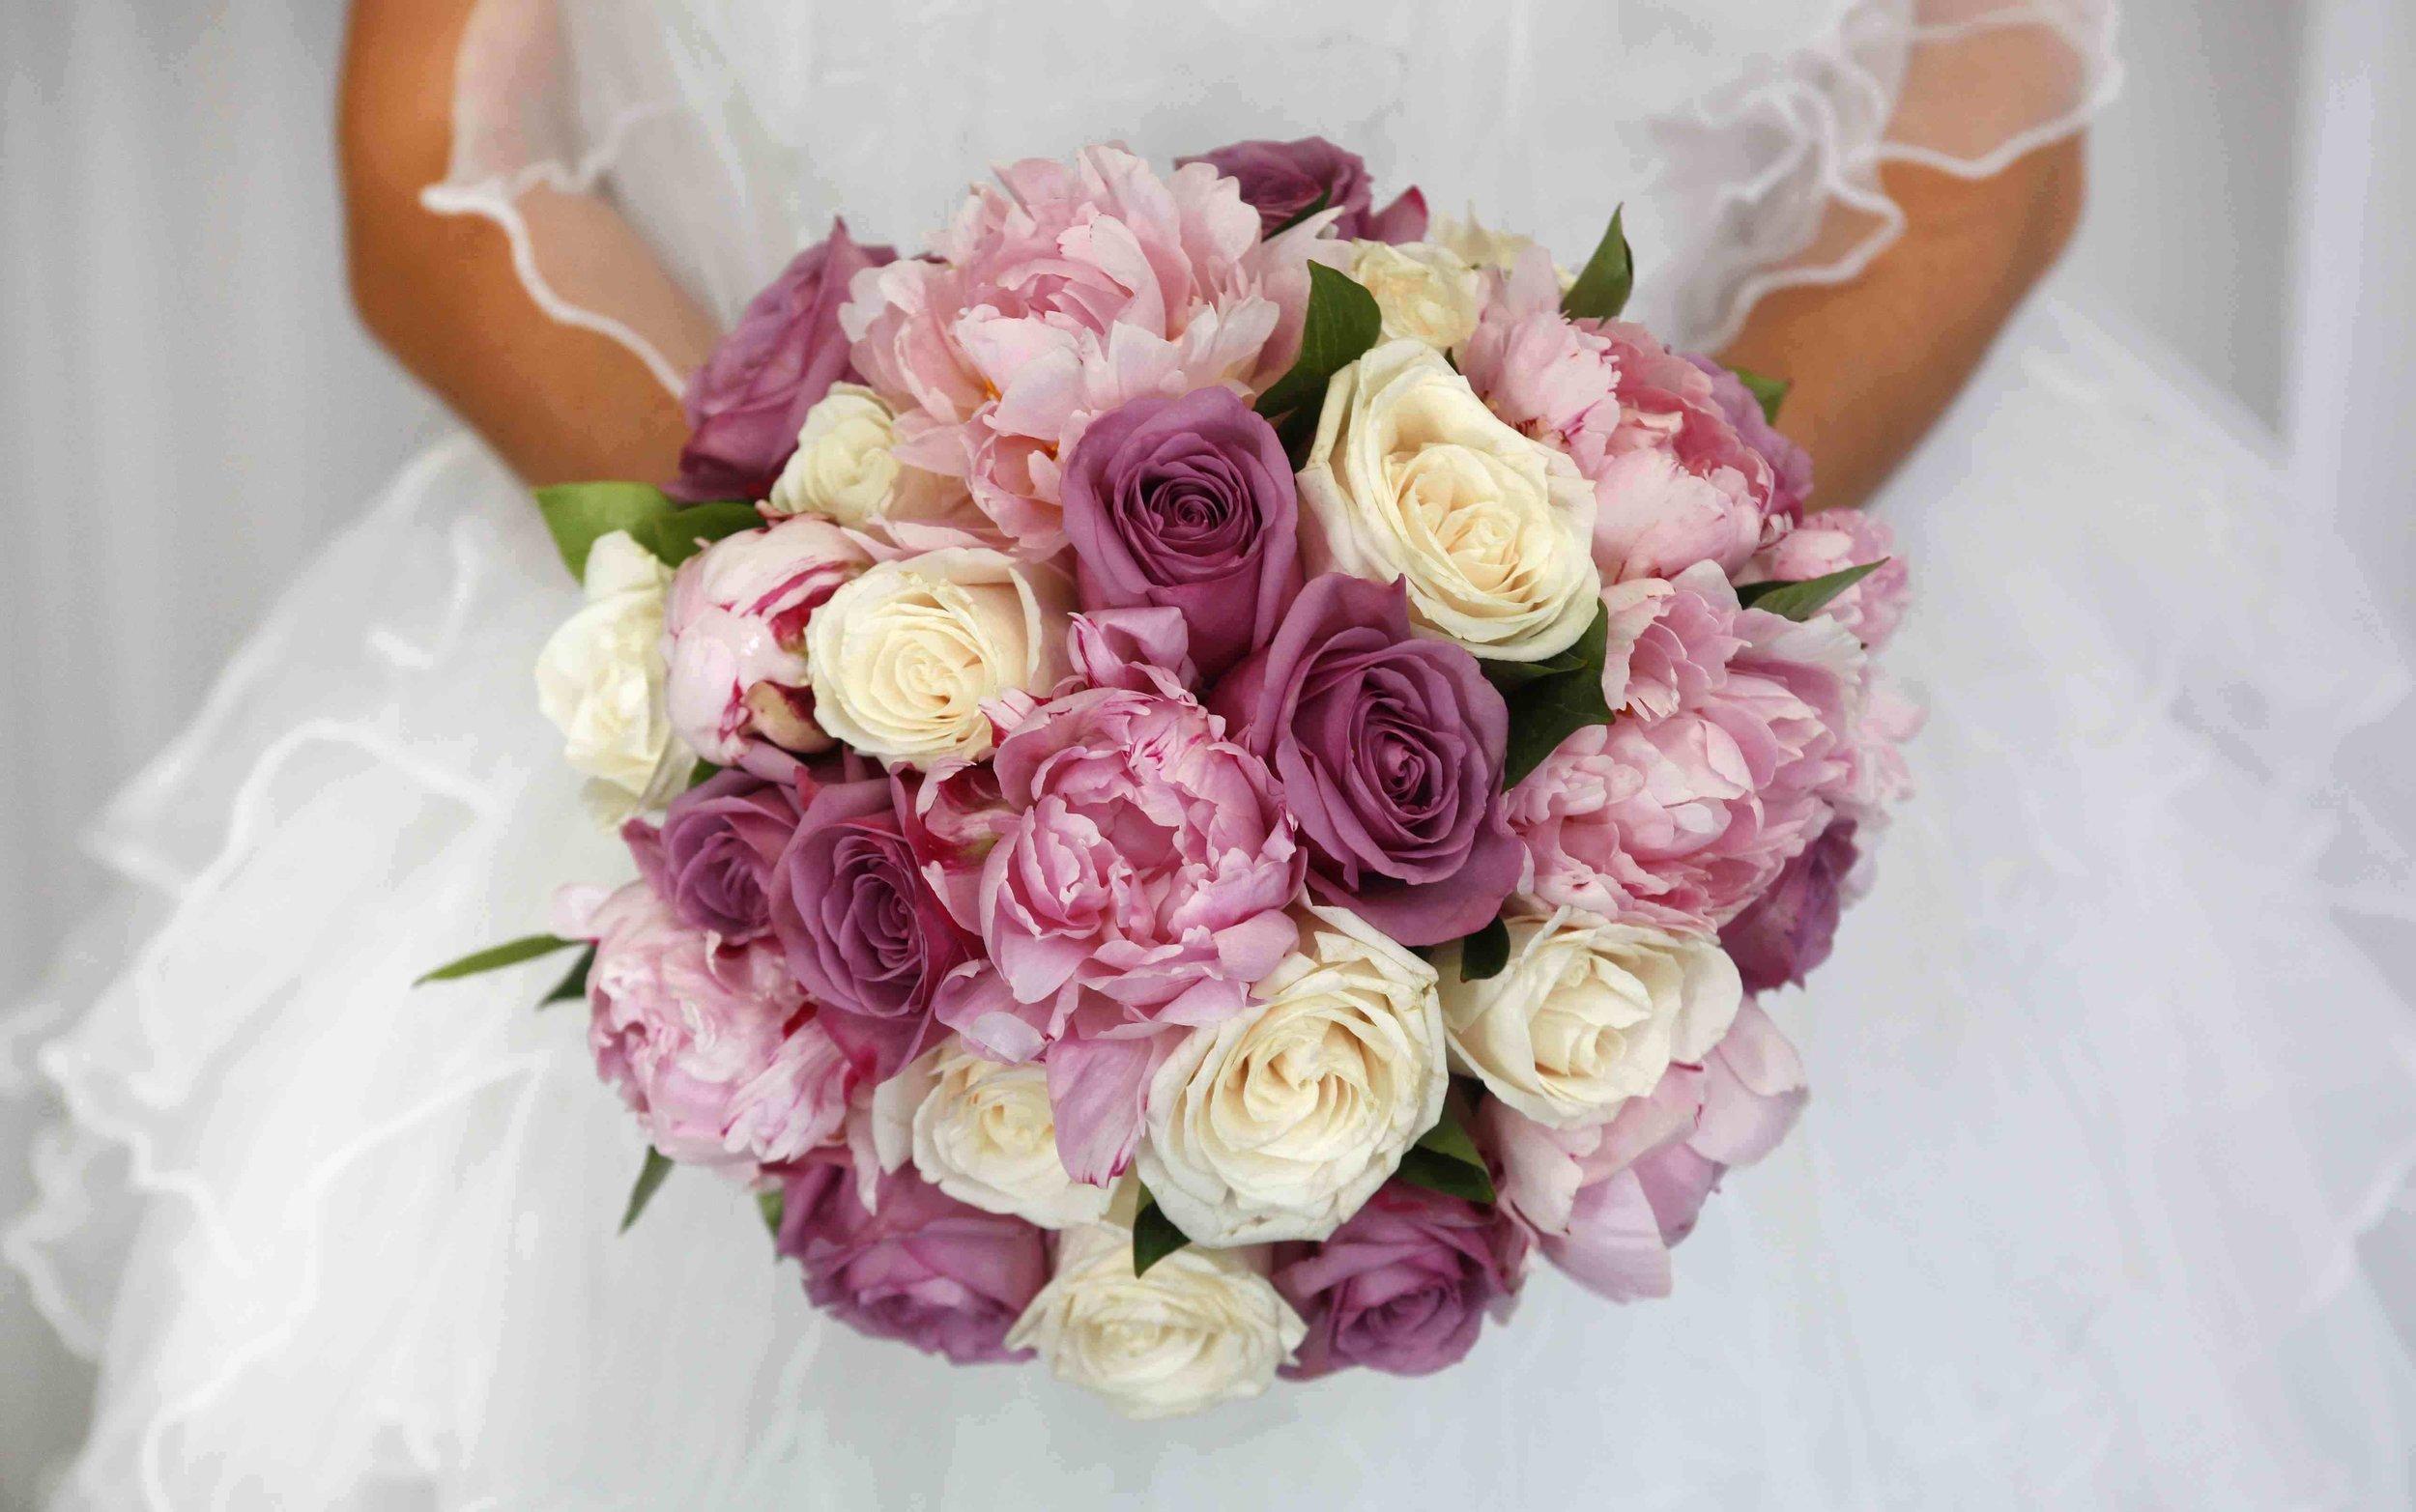 large_round_bride_bouquet_sydney_florist_peonies_roses.jpg